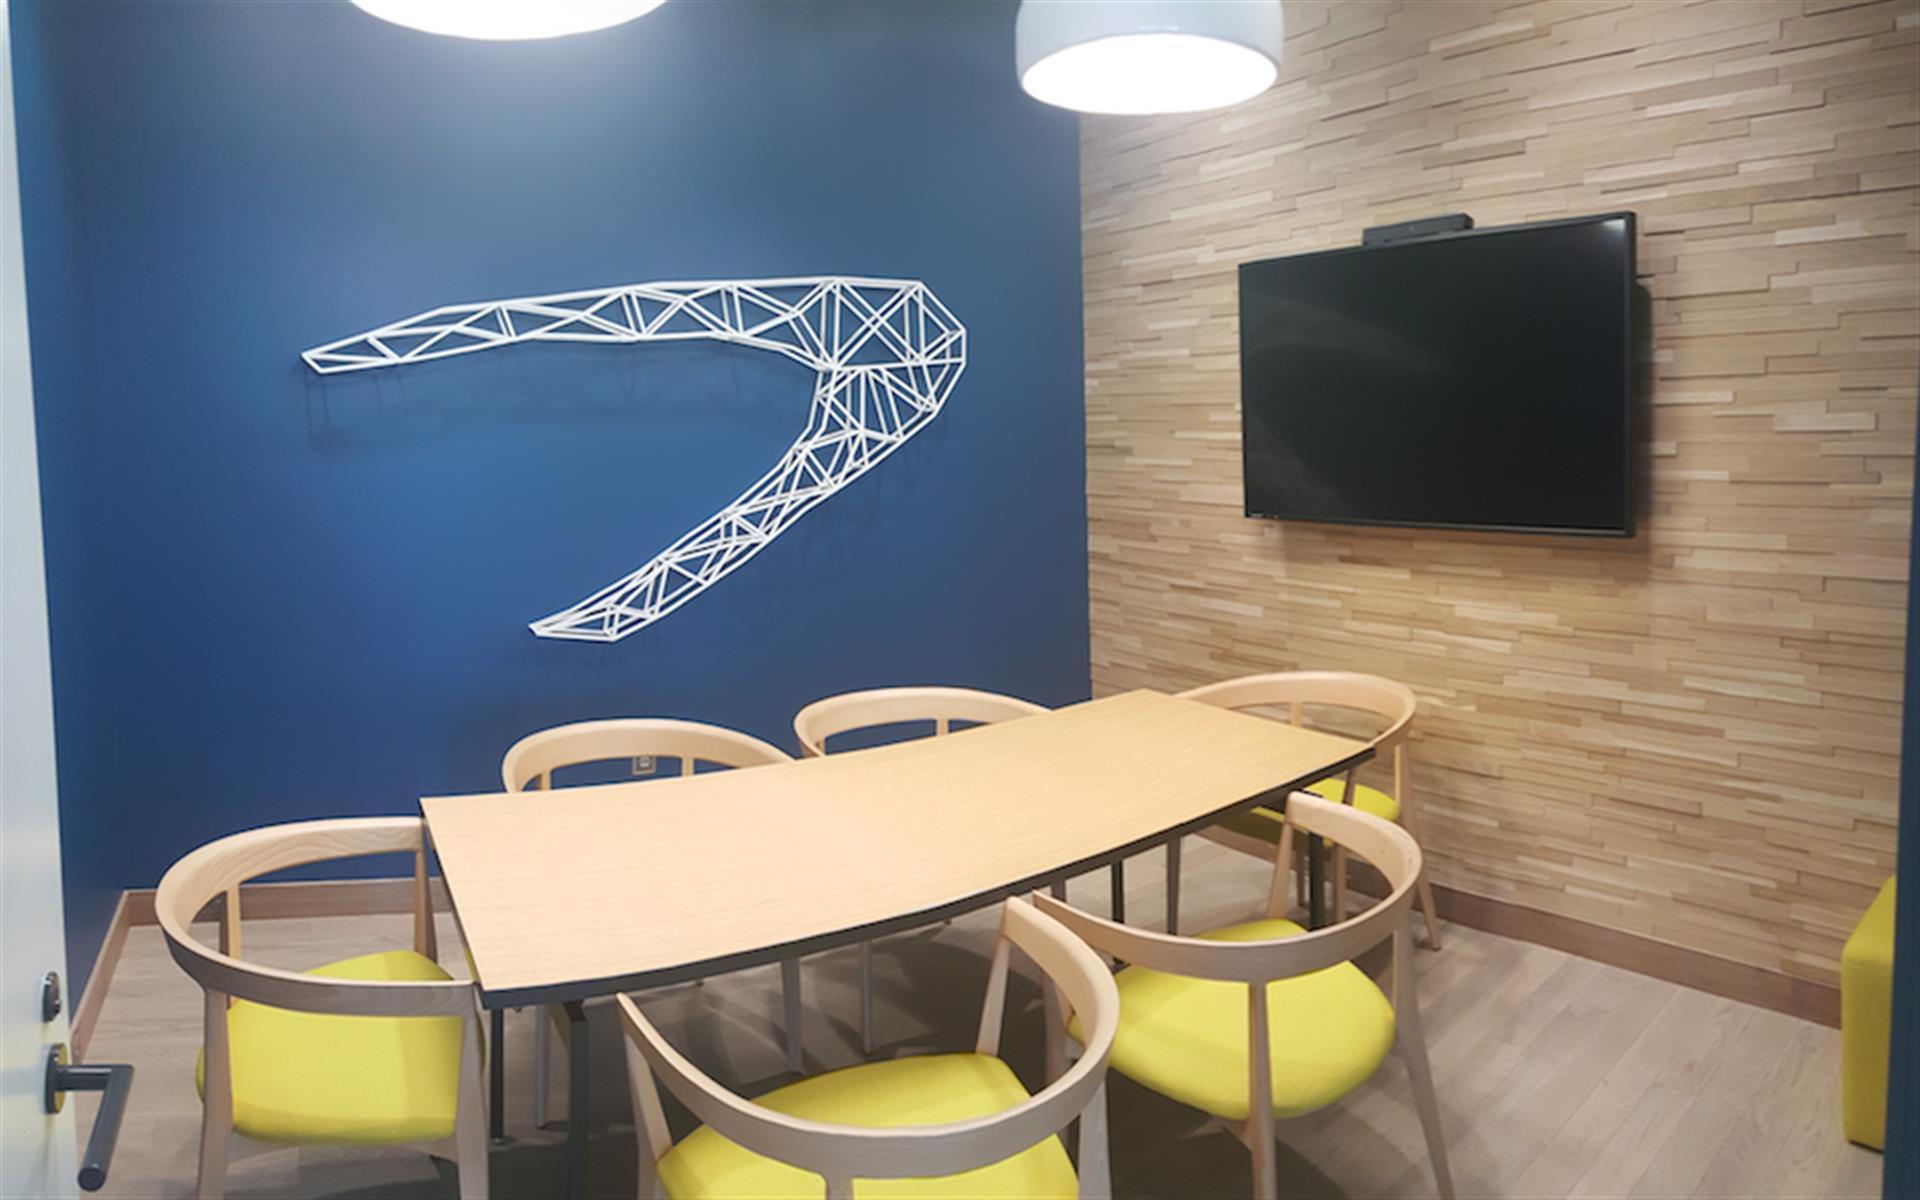 Capital One Café - Seaport - The Capital One Community Room #1